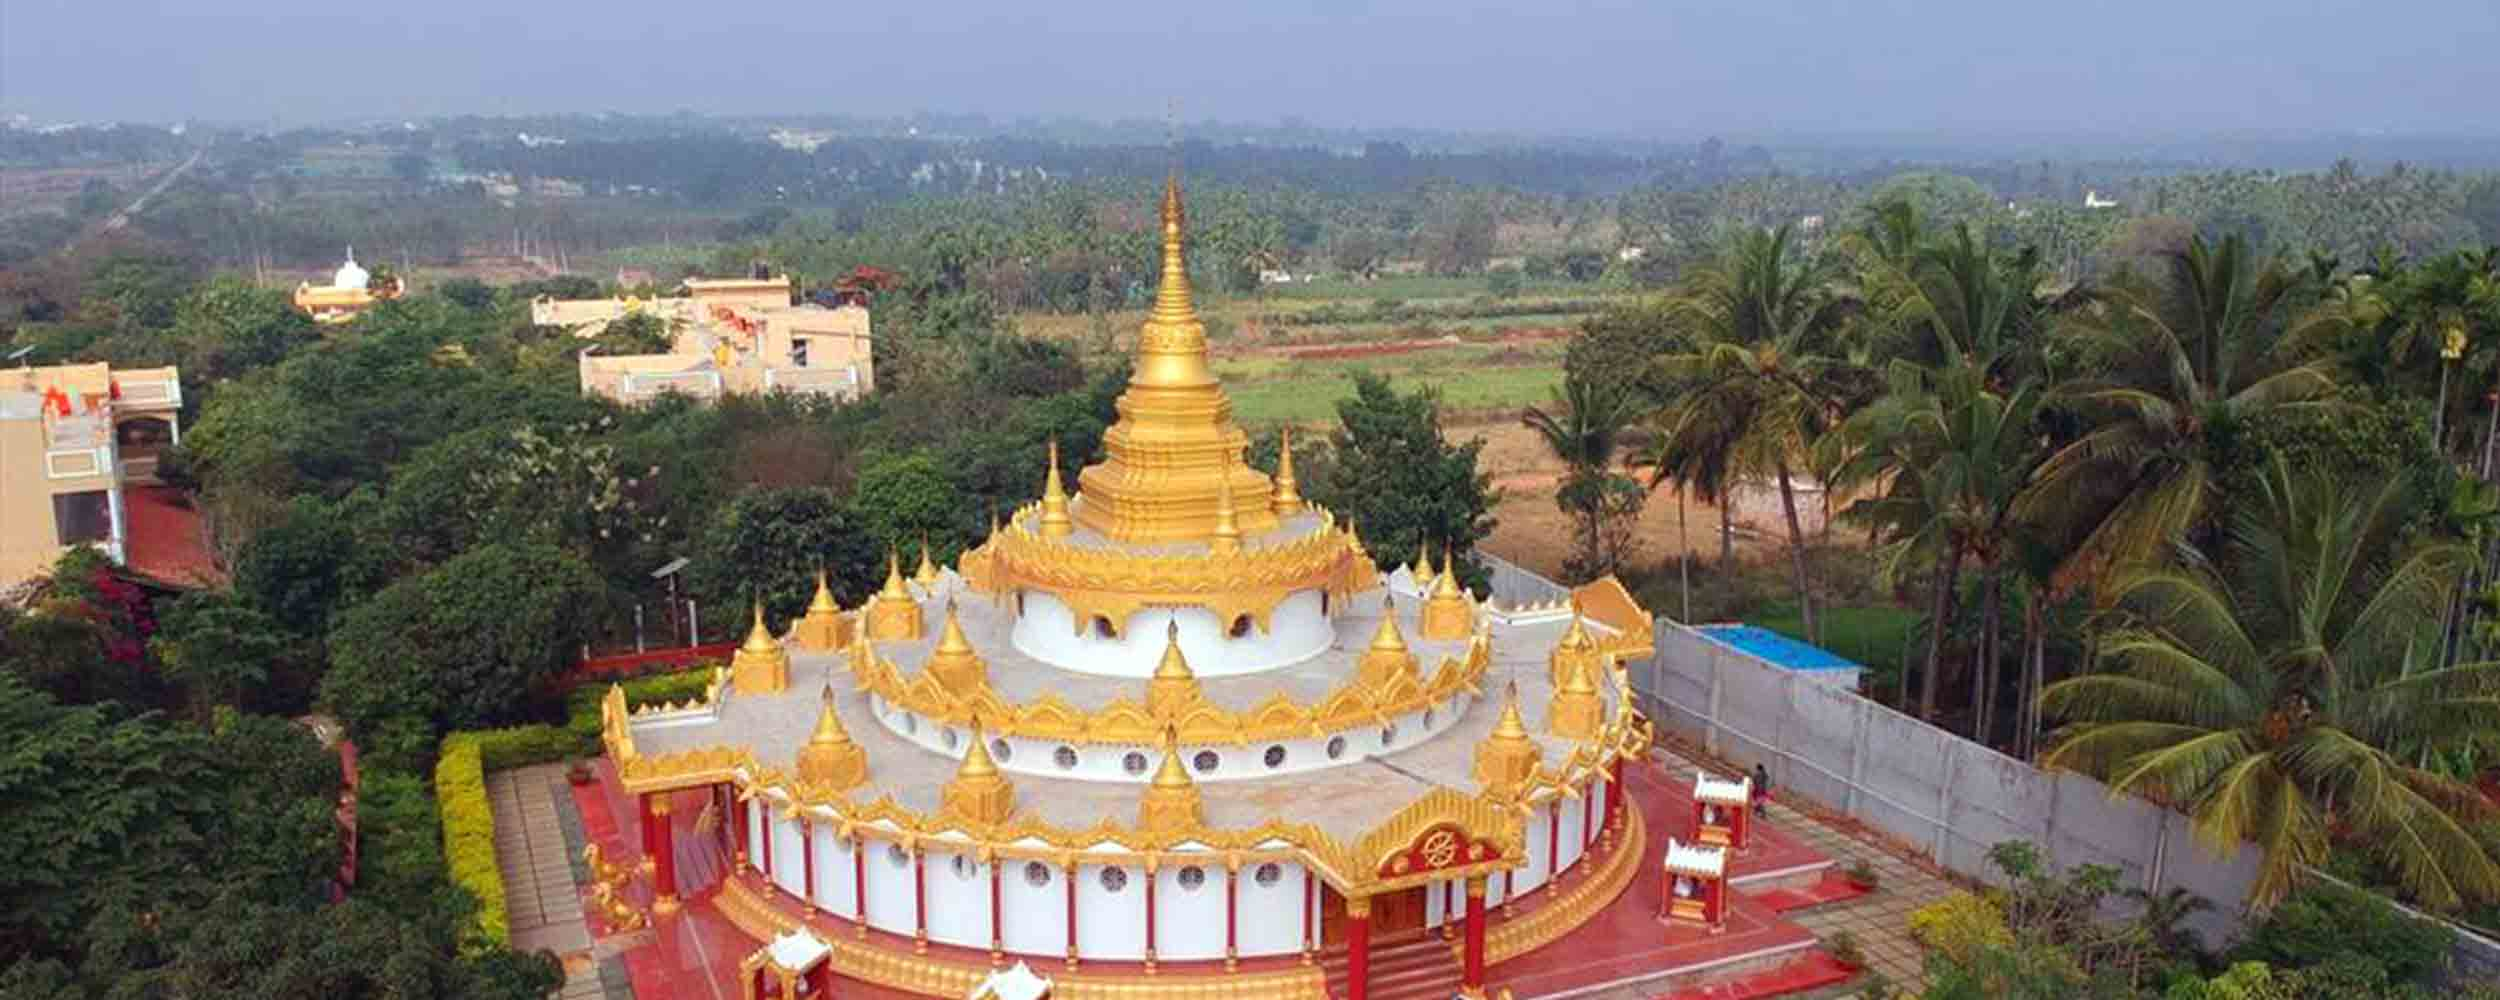 mahabodhi-meditation-center